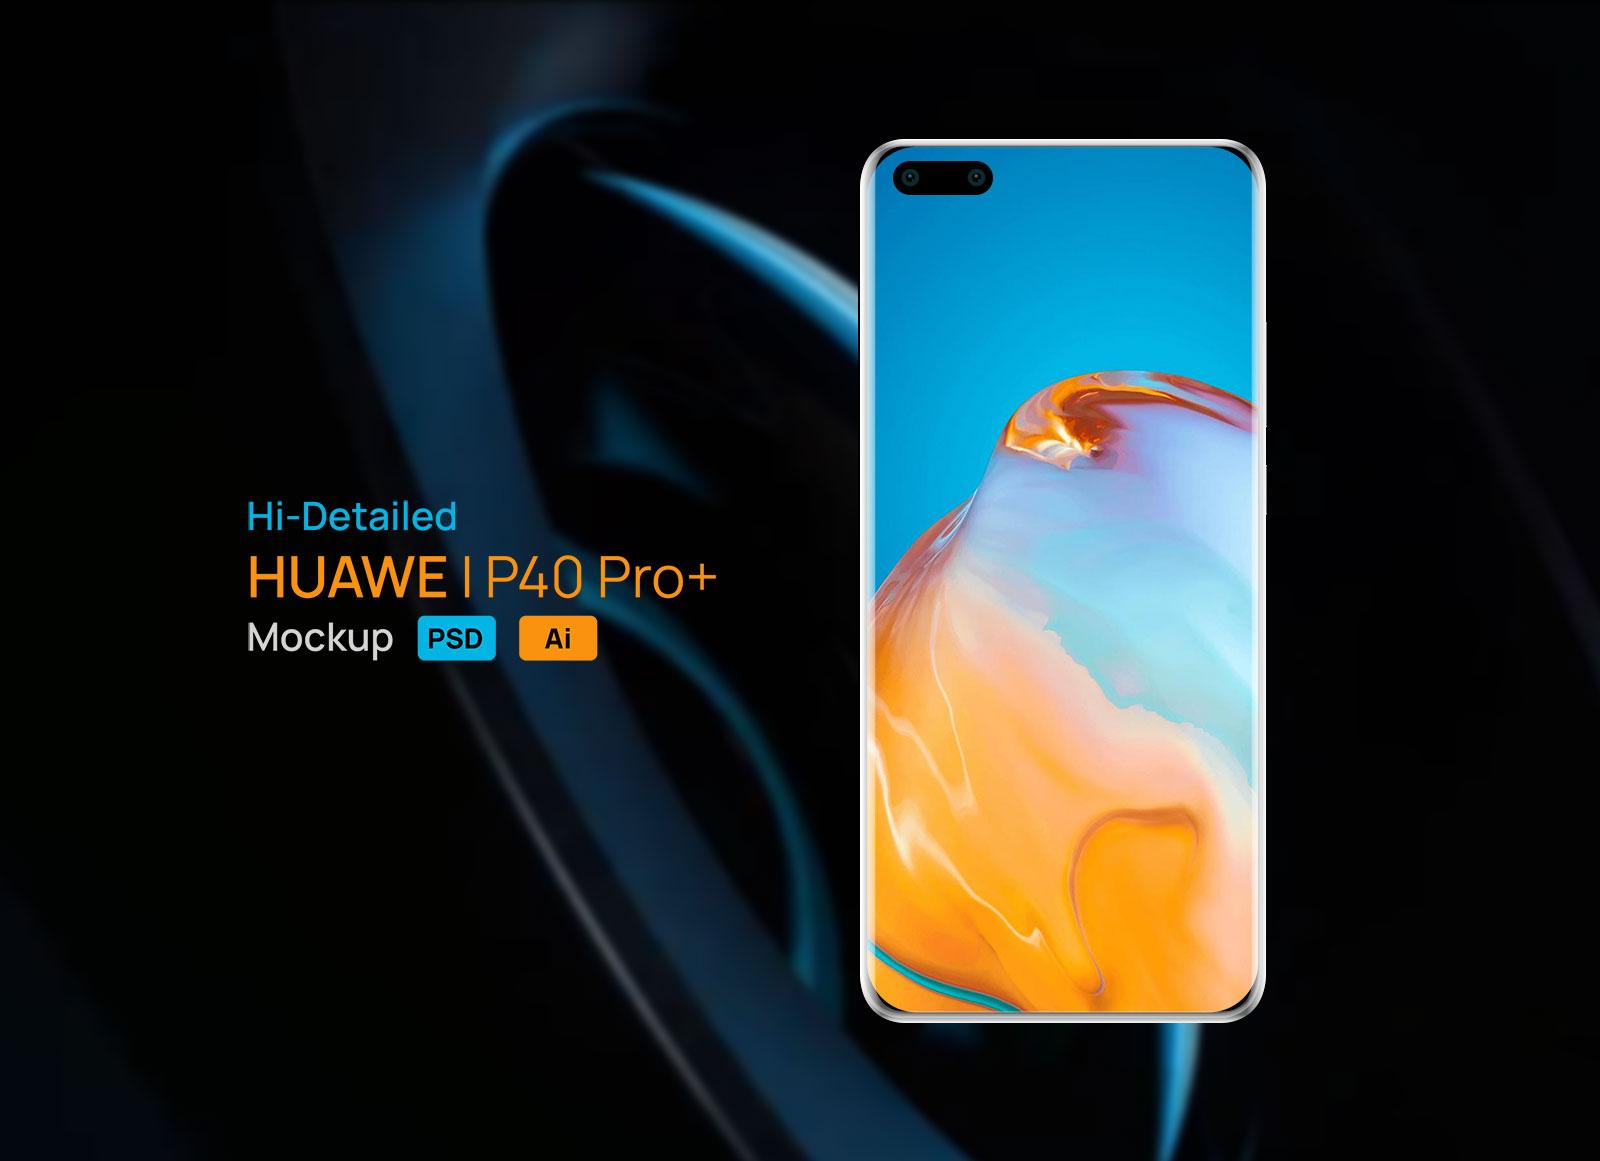 free-huawei-p40-pro-plus-mockup-psd